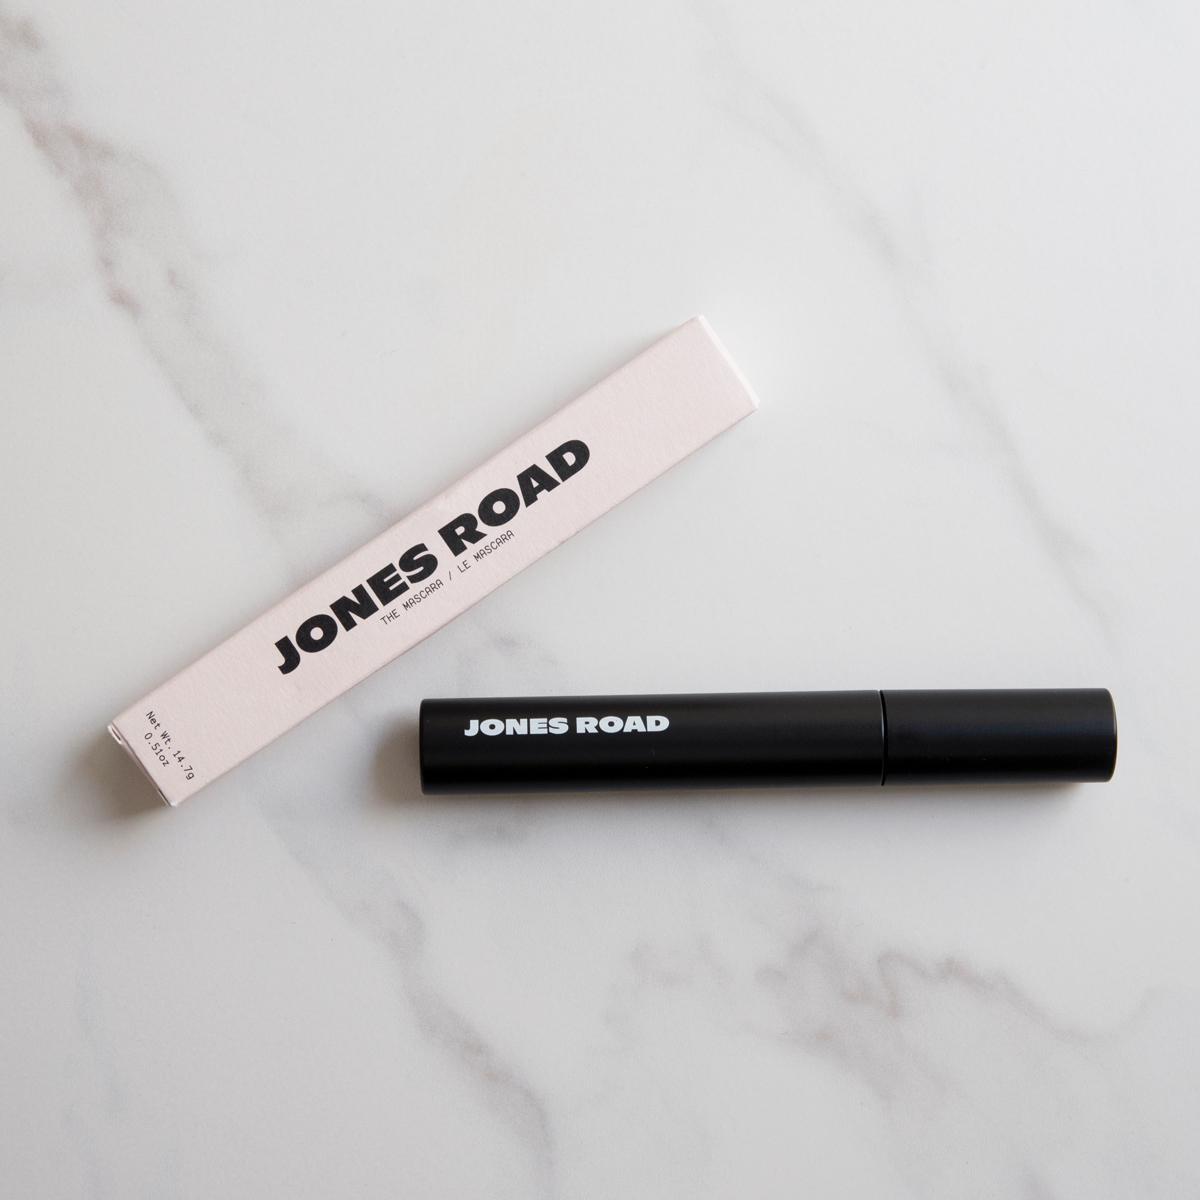 Jones Road The Mascara